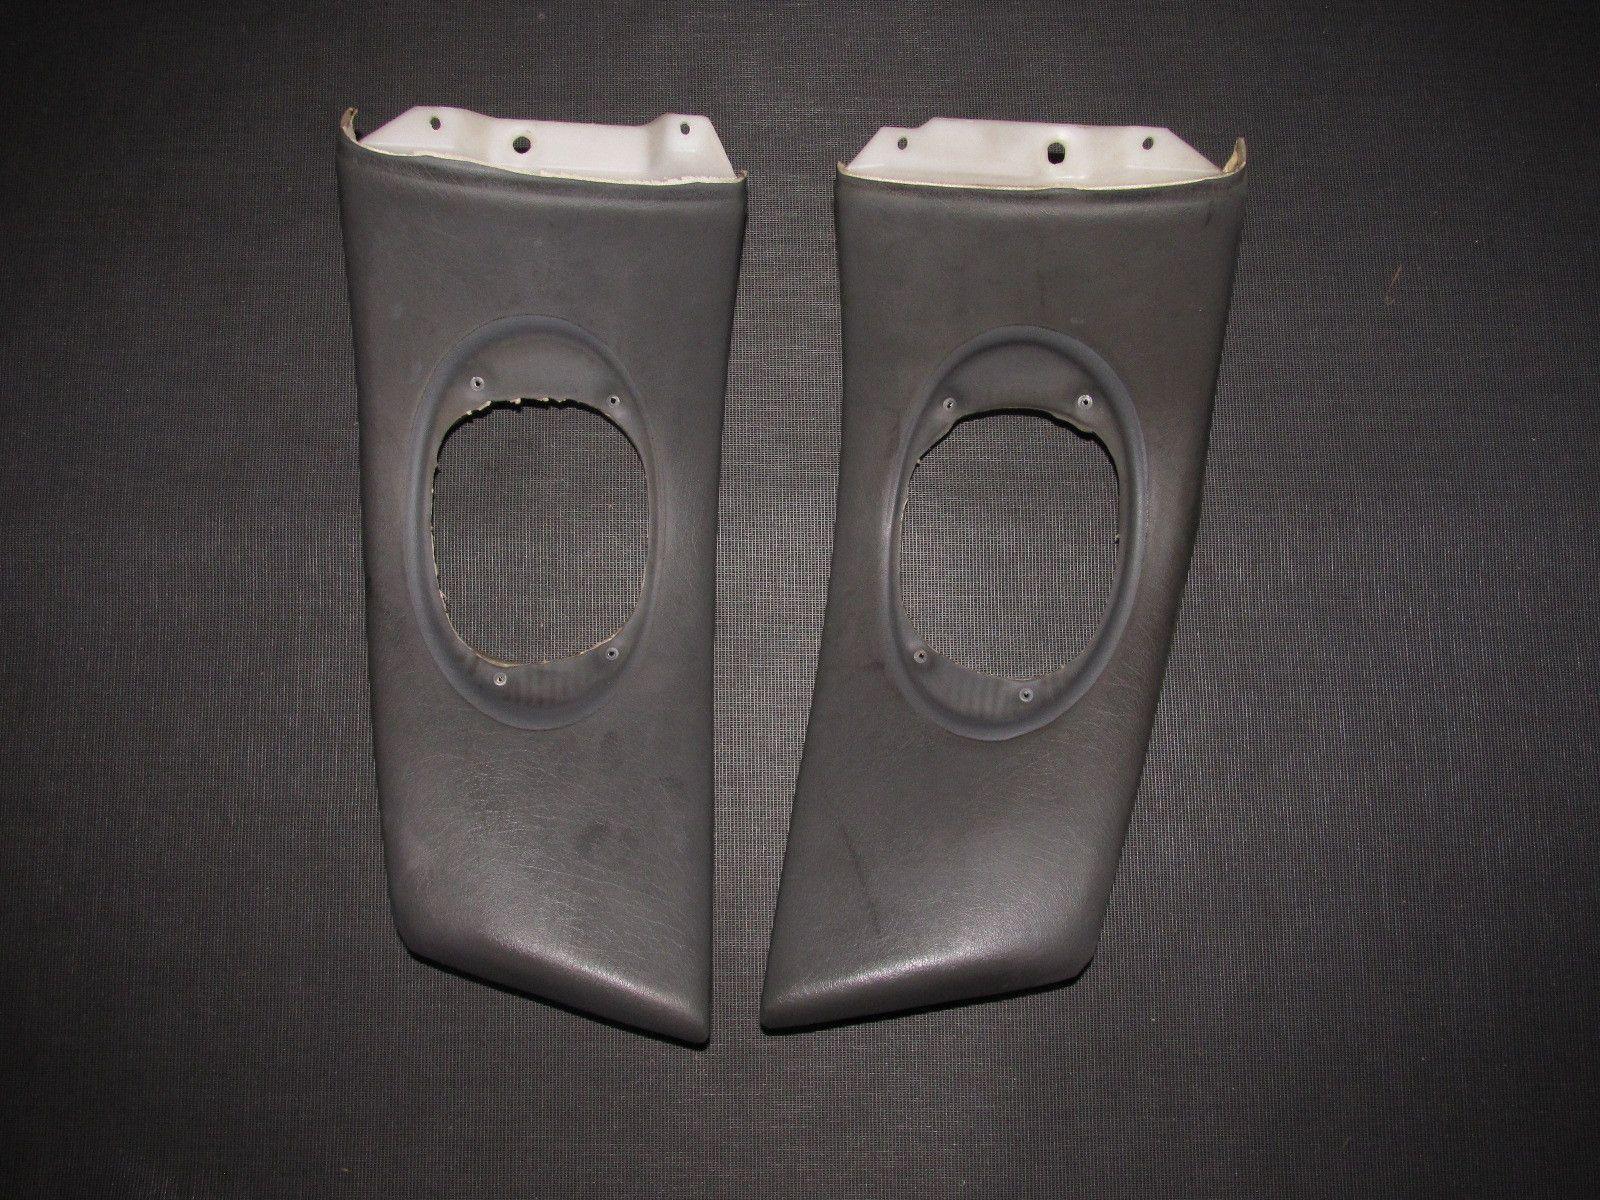 93 94 95 96 97 Honda Del Sol OEM Interior Rear Speaker Panel Cover